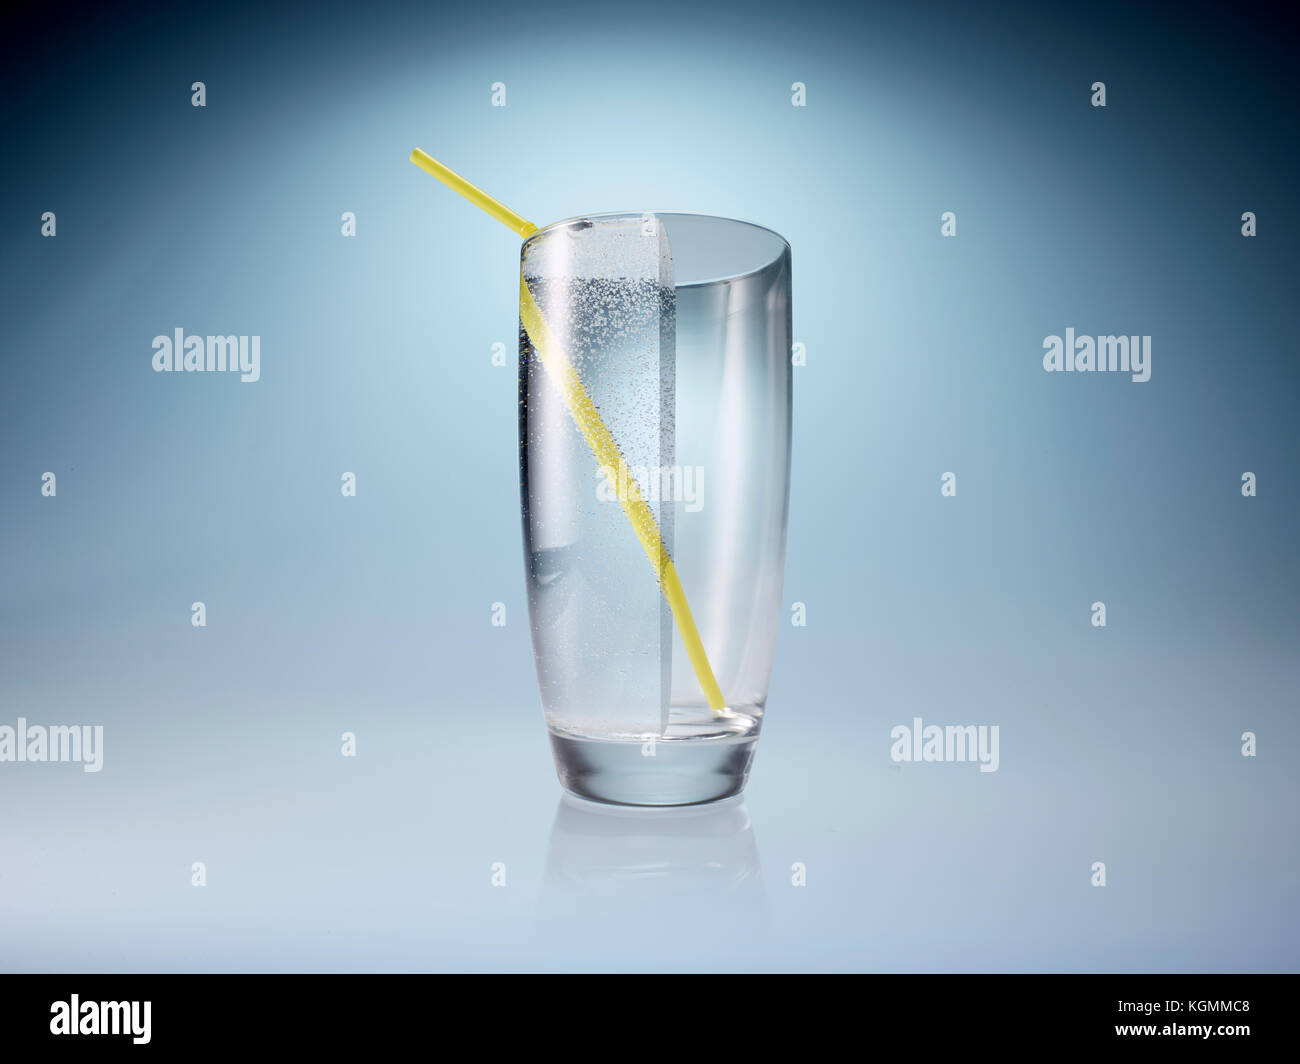 Glass half full or half empty - Stock Image